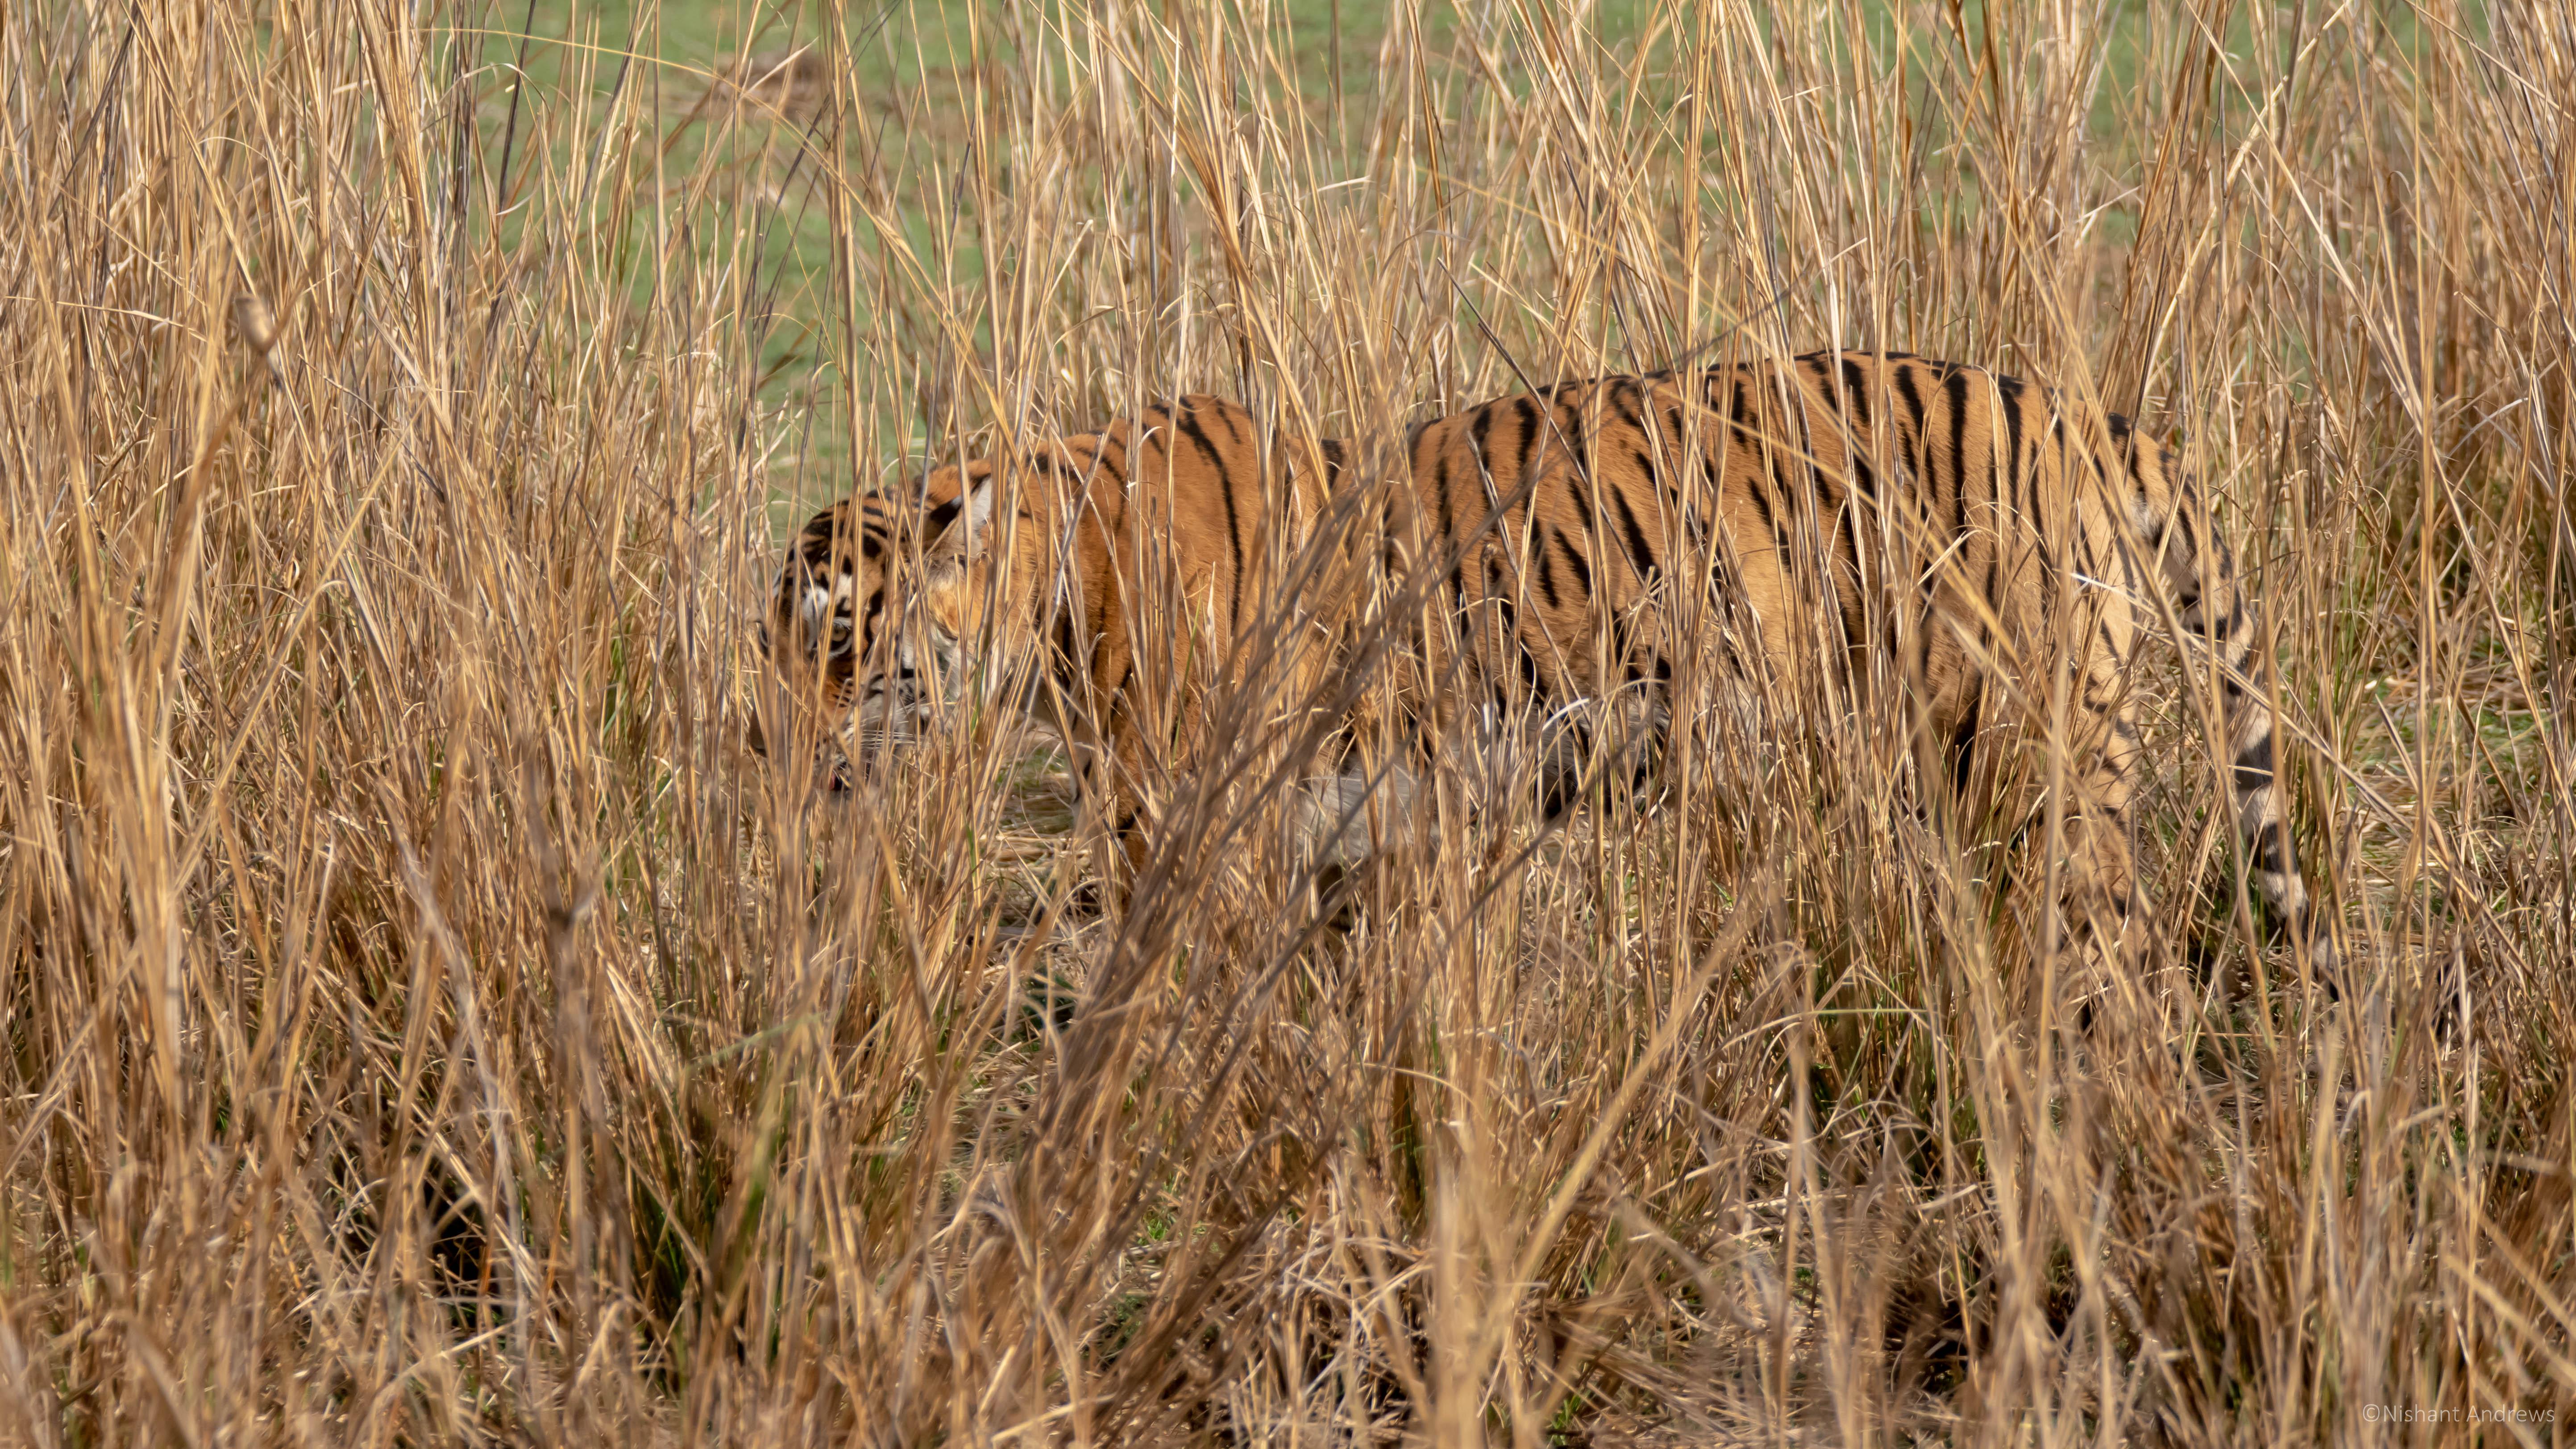 Bengal tiger (female) in hiding